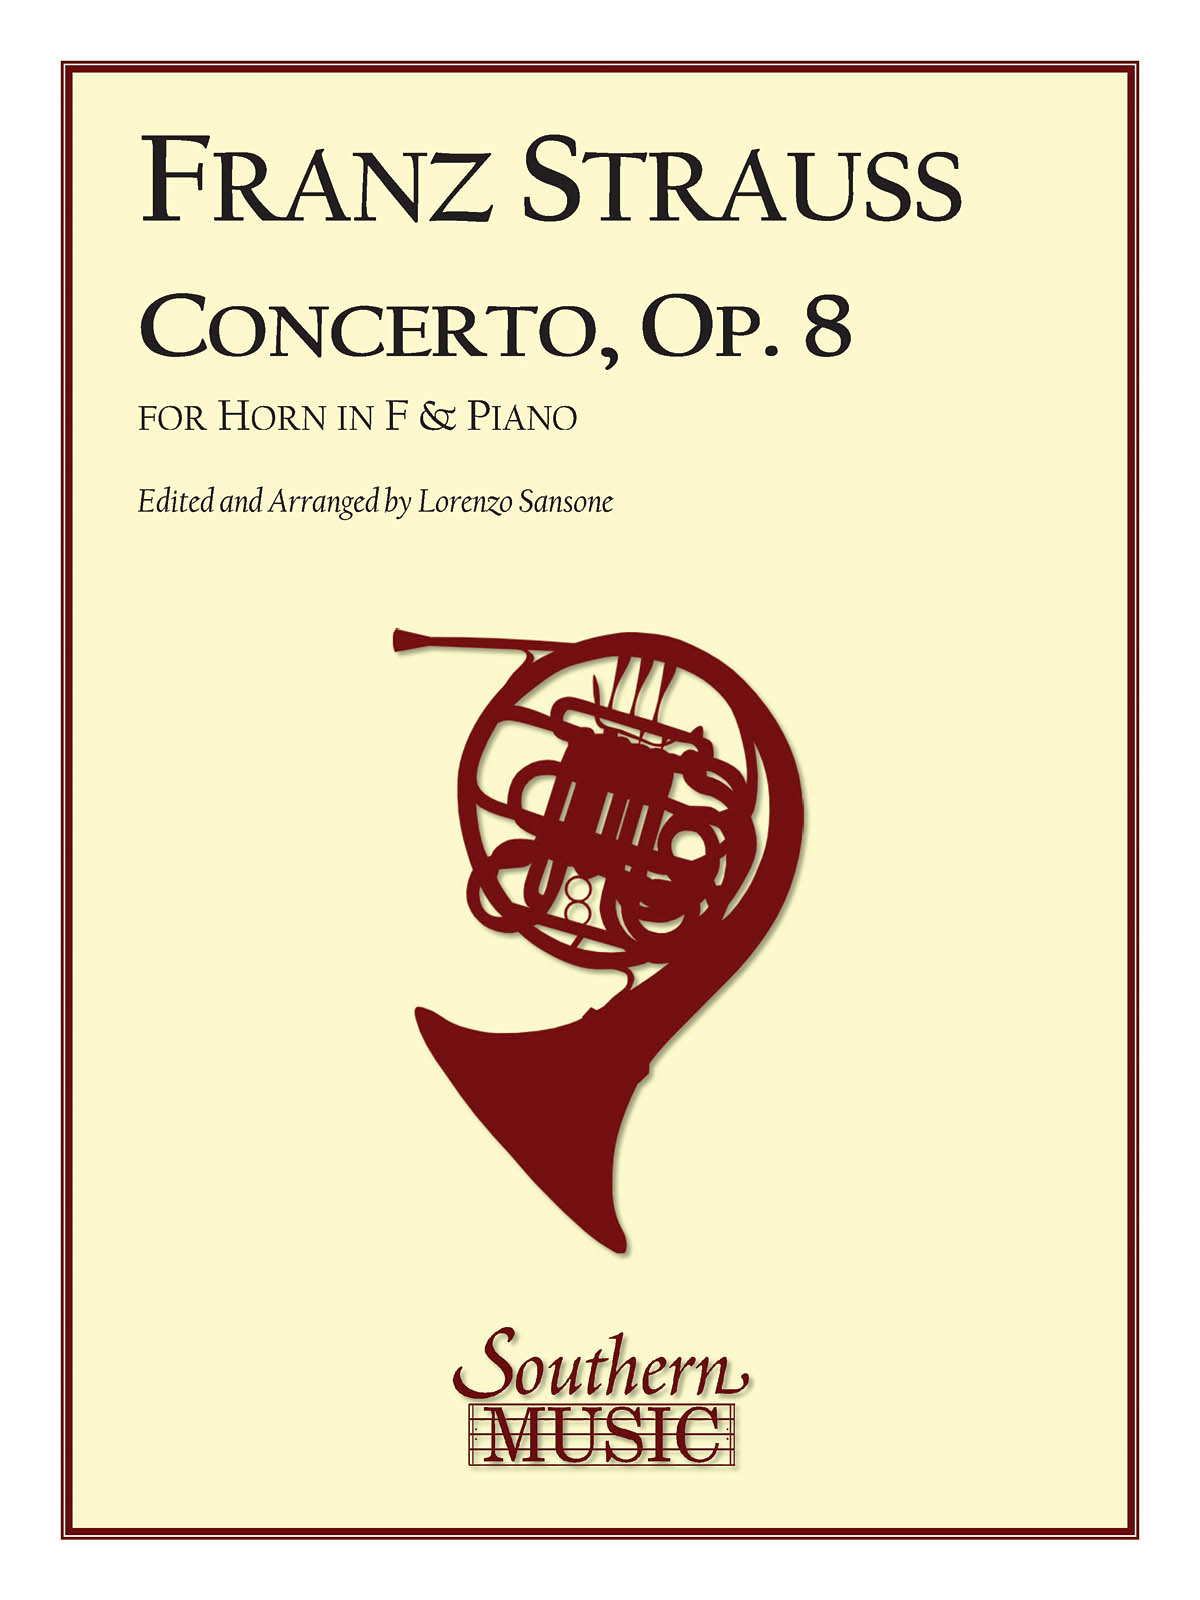 Franz Strauss: Concerto In C Minor  Op. 8: French Horn Solo: Instrumental Album